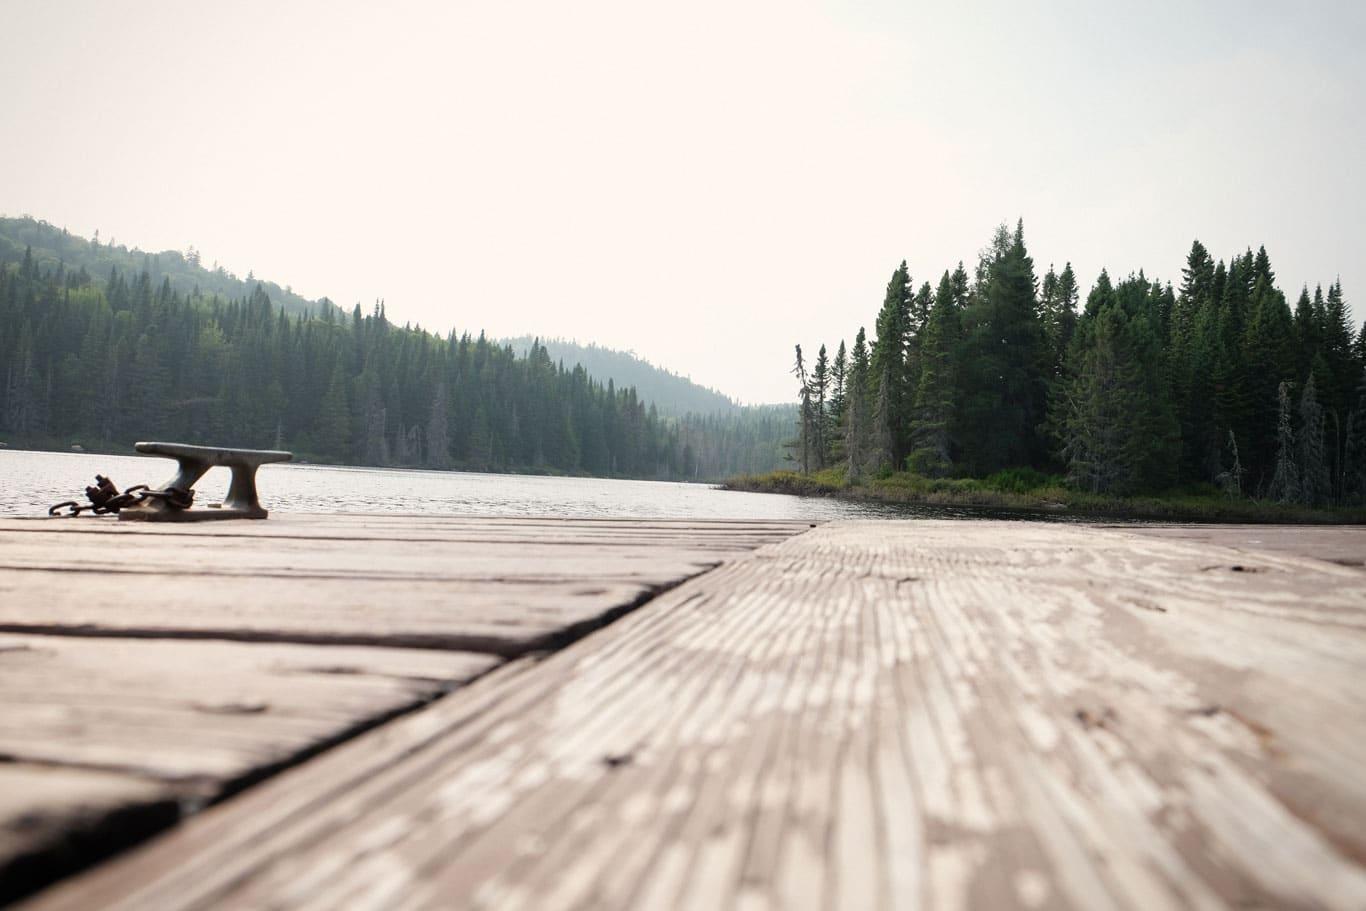 dock overlooking lake and mountains